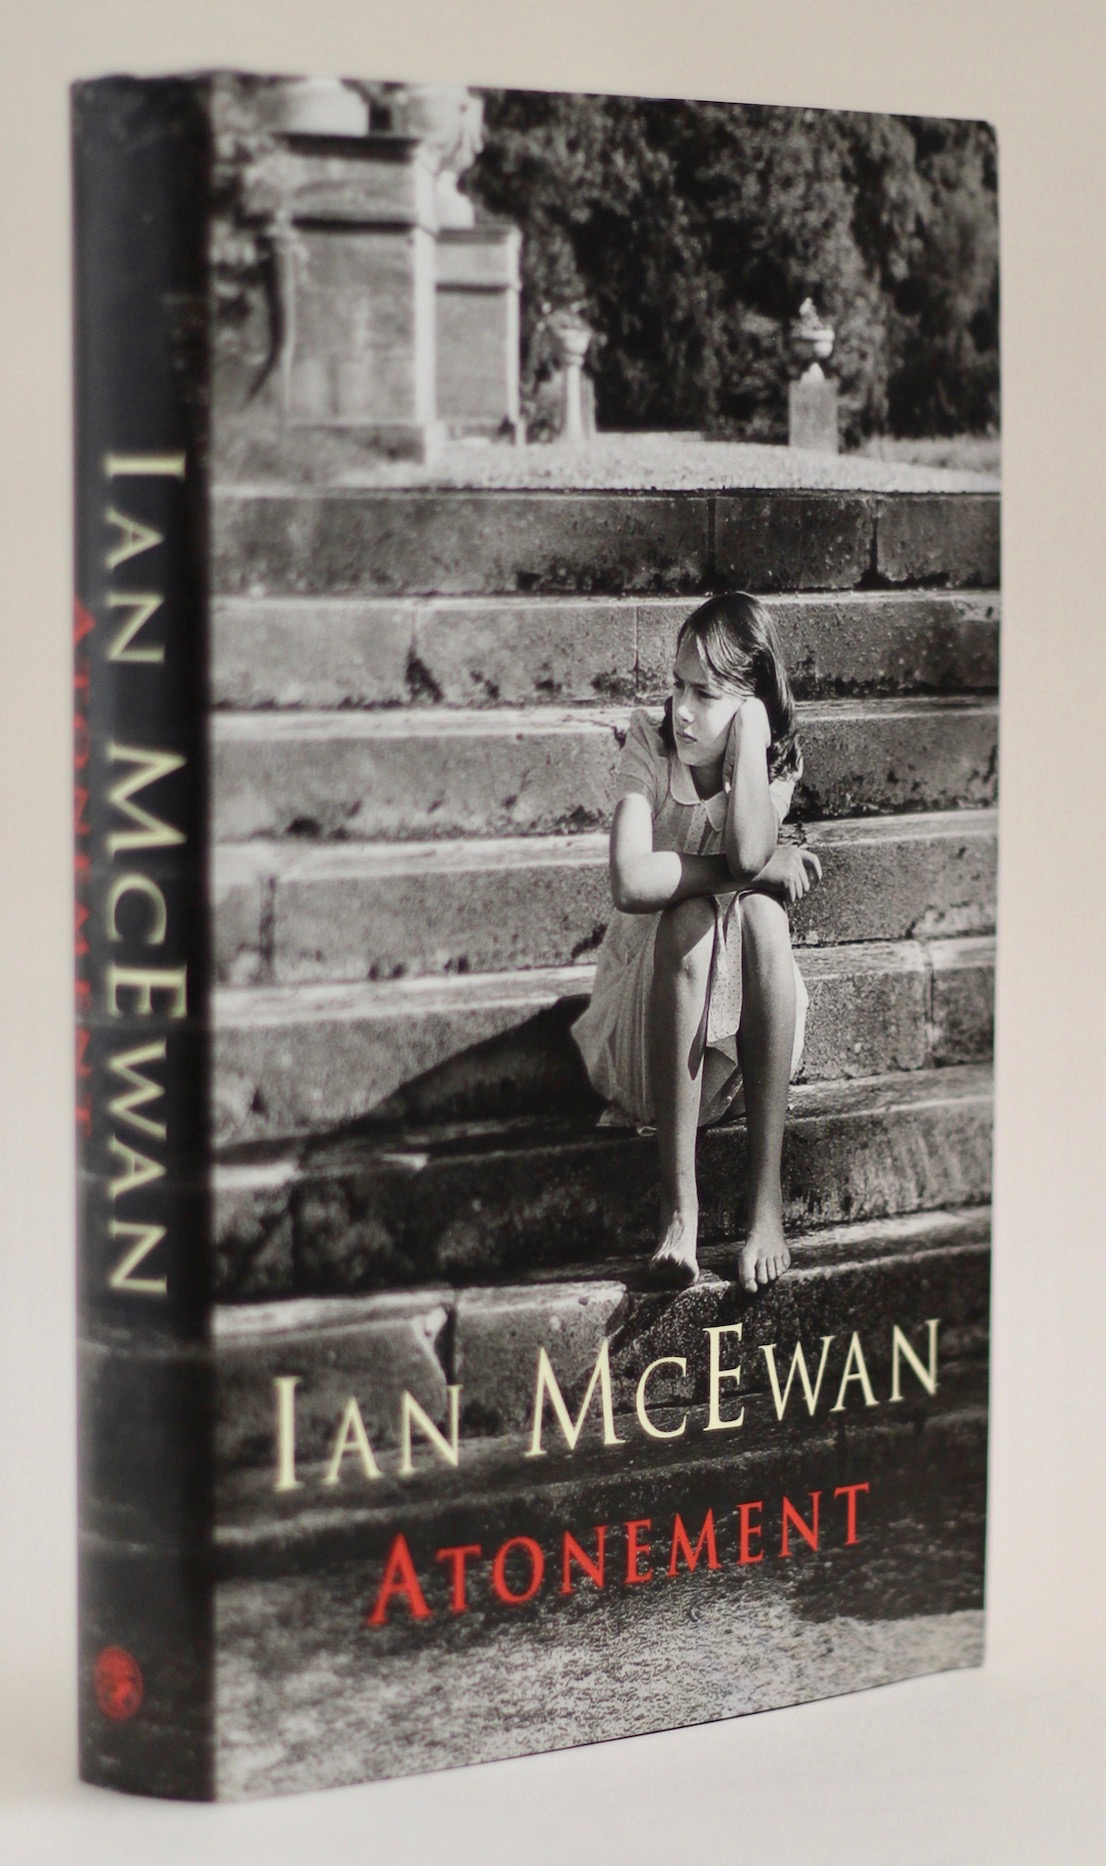 Ian McEwan: Atonement, 2001. £17.50